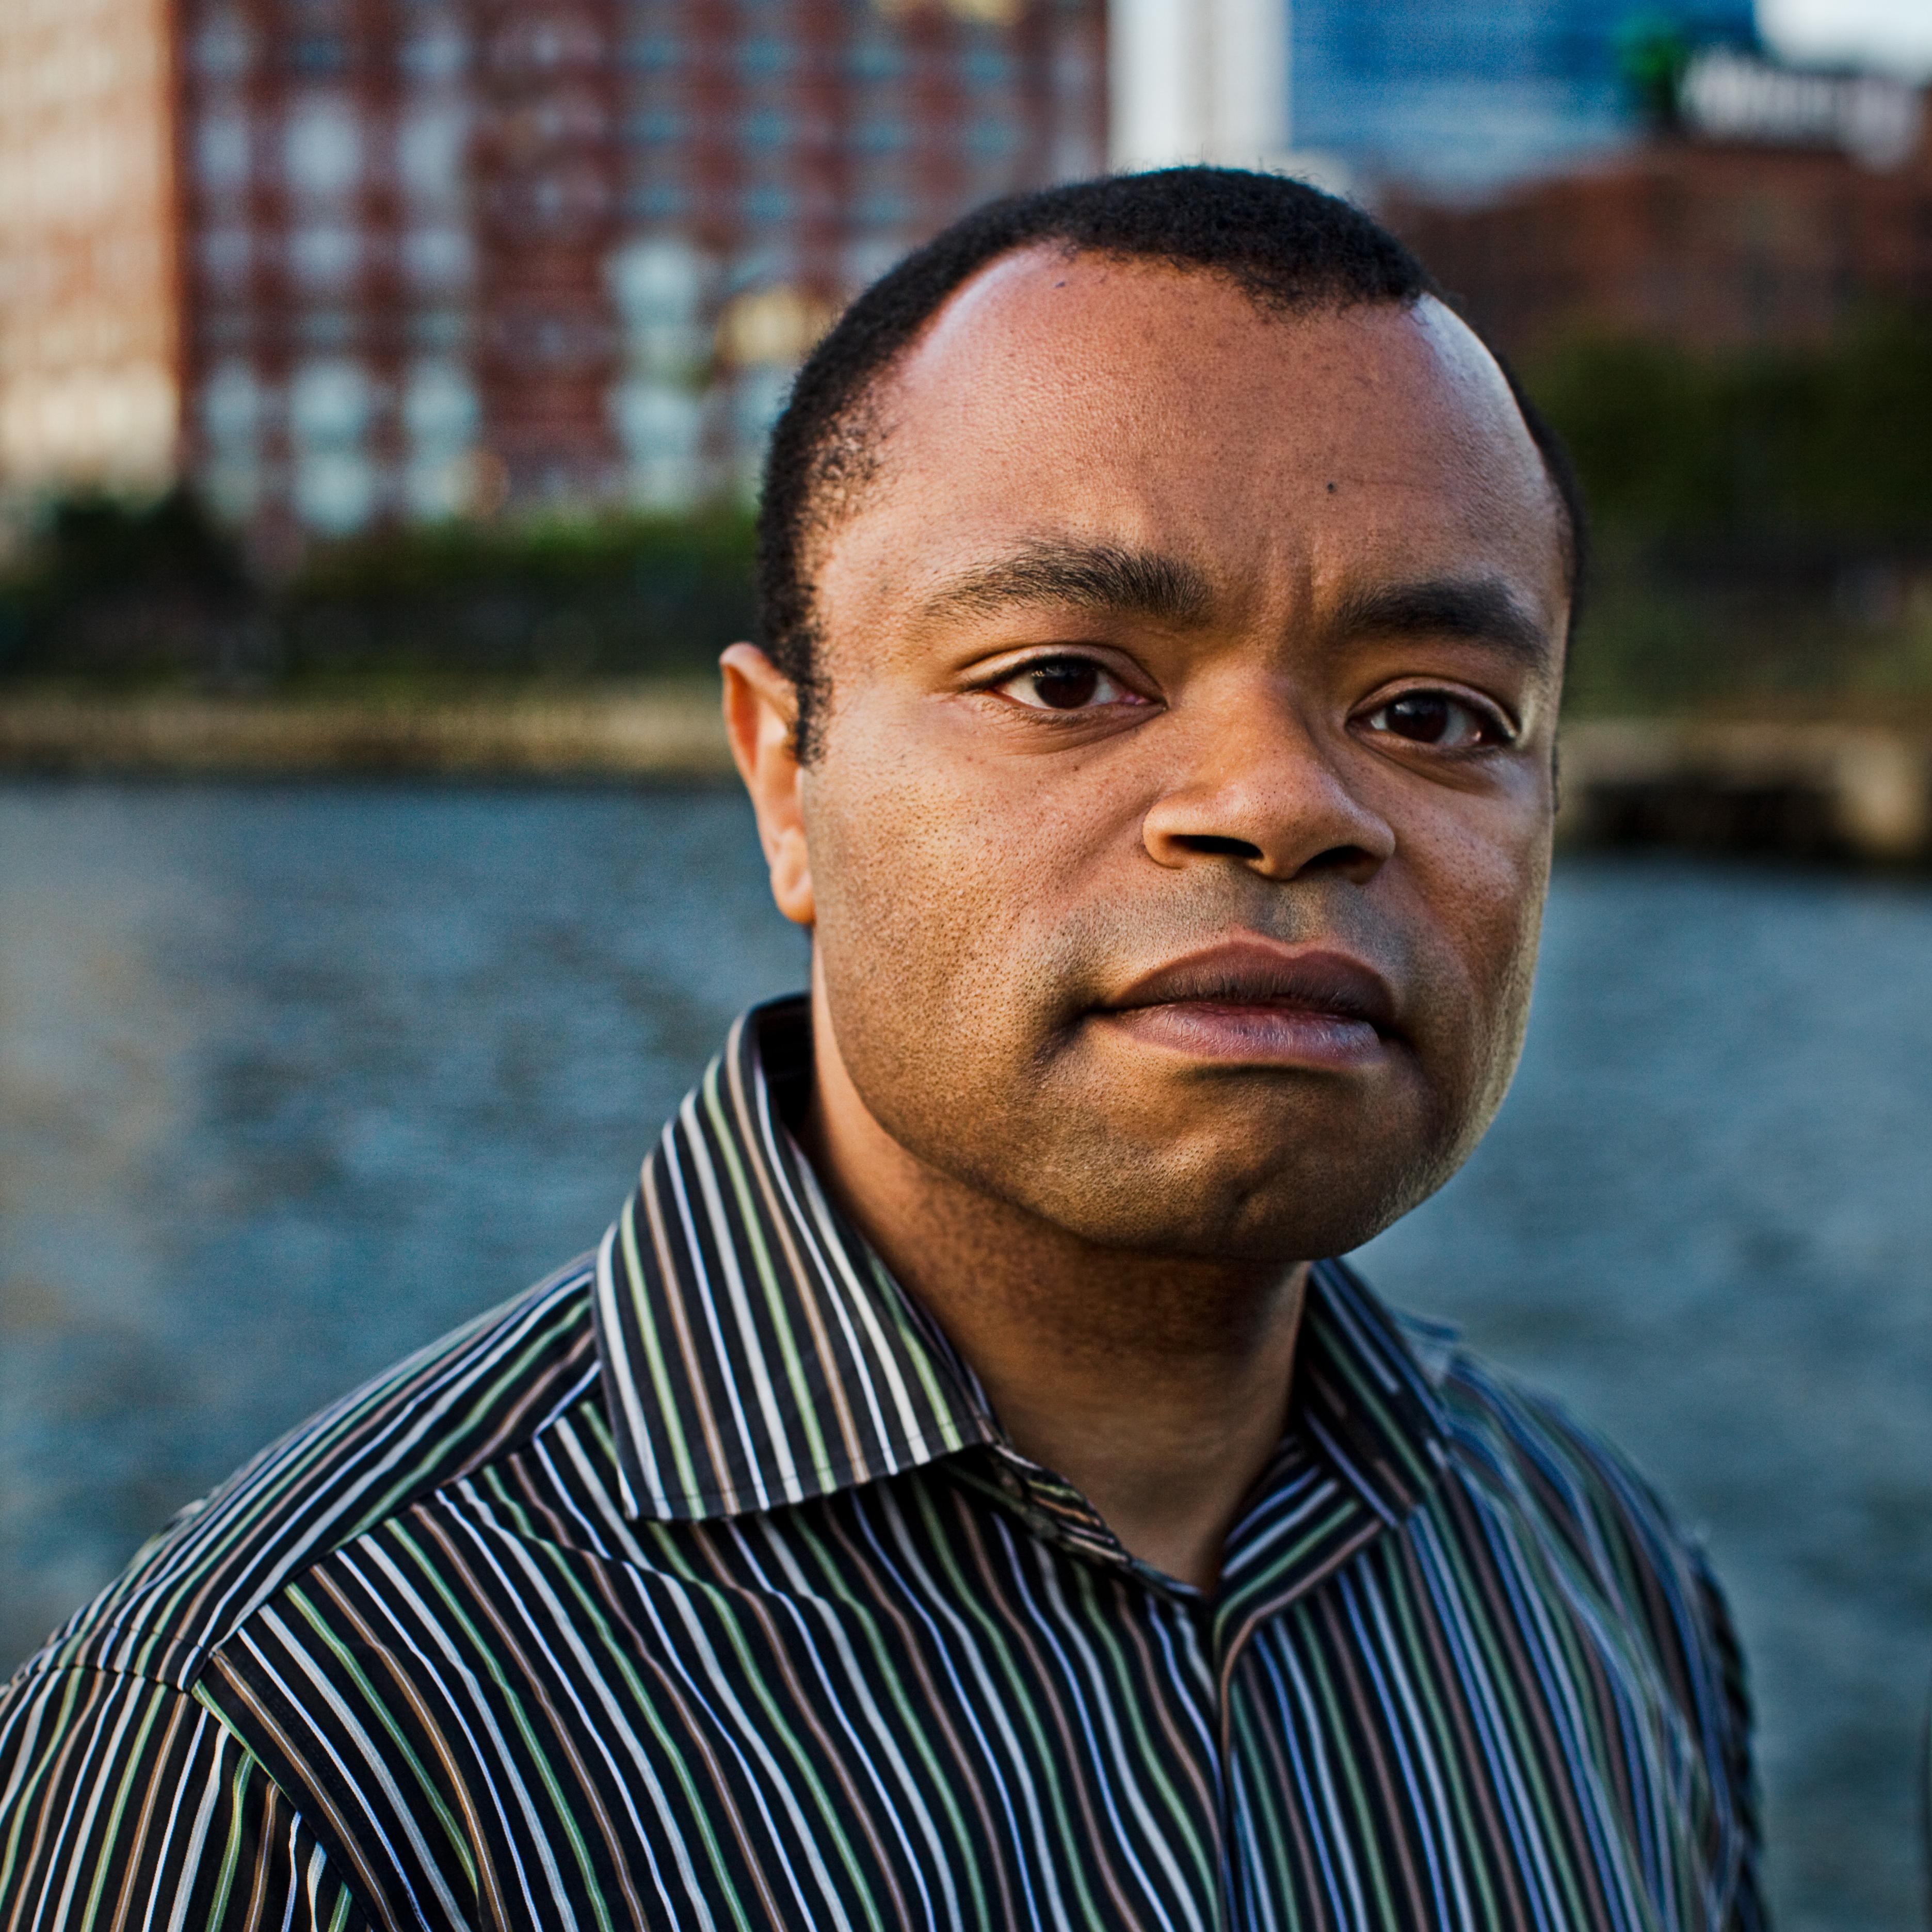 Dexter Palmer, photo by Bill Wadman